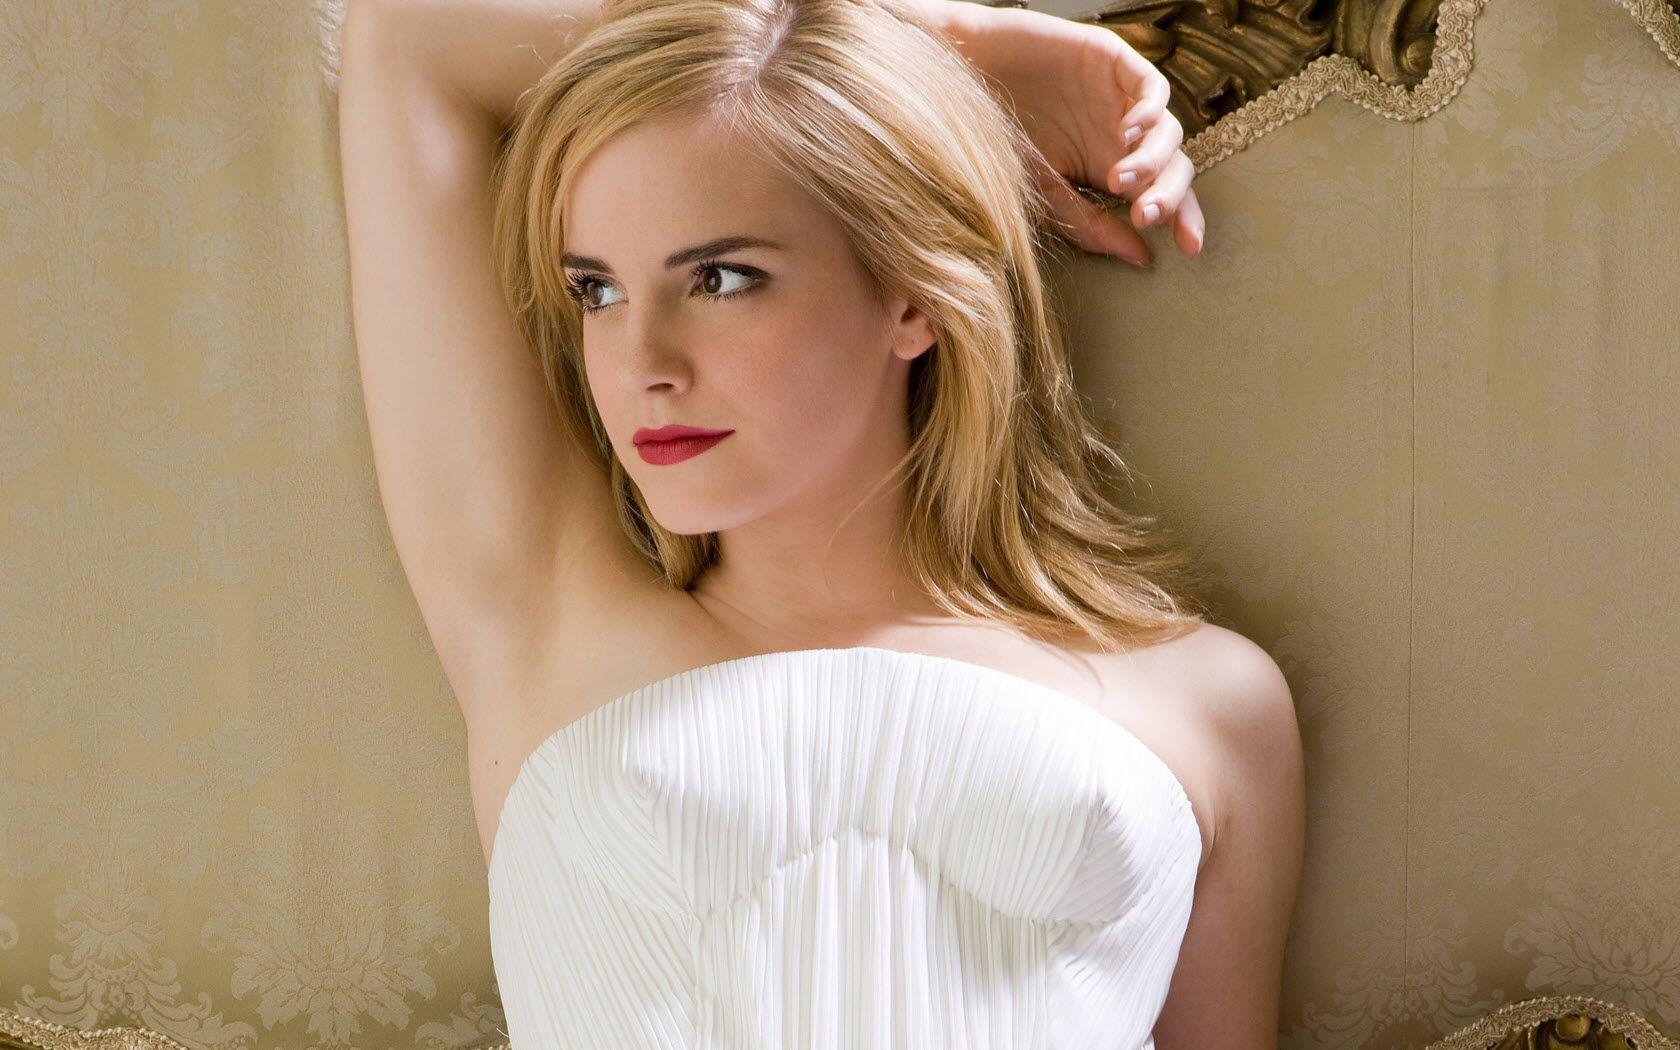 Google themes emma watson - Emma Watson Wallpapers Http Www Firsthdwallpapers Com Emma